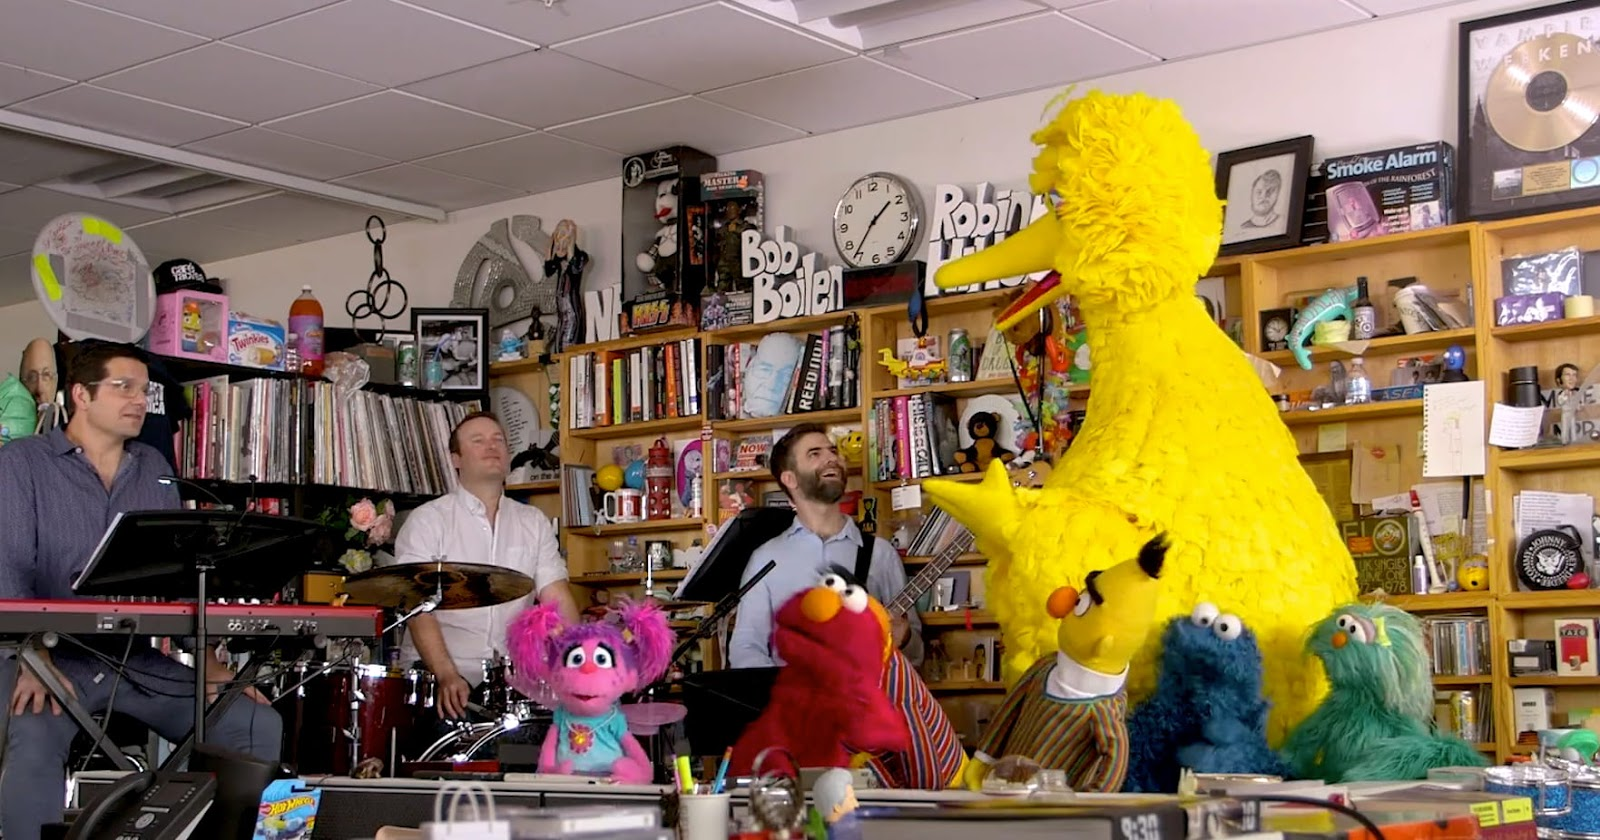 Muppets, Sesamstrasse, Sesamestreet, tiny desk concert, musik,